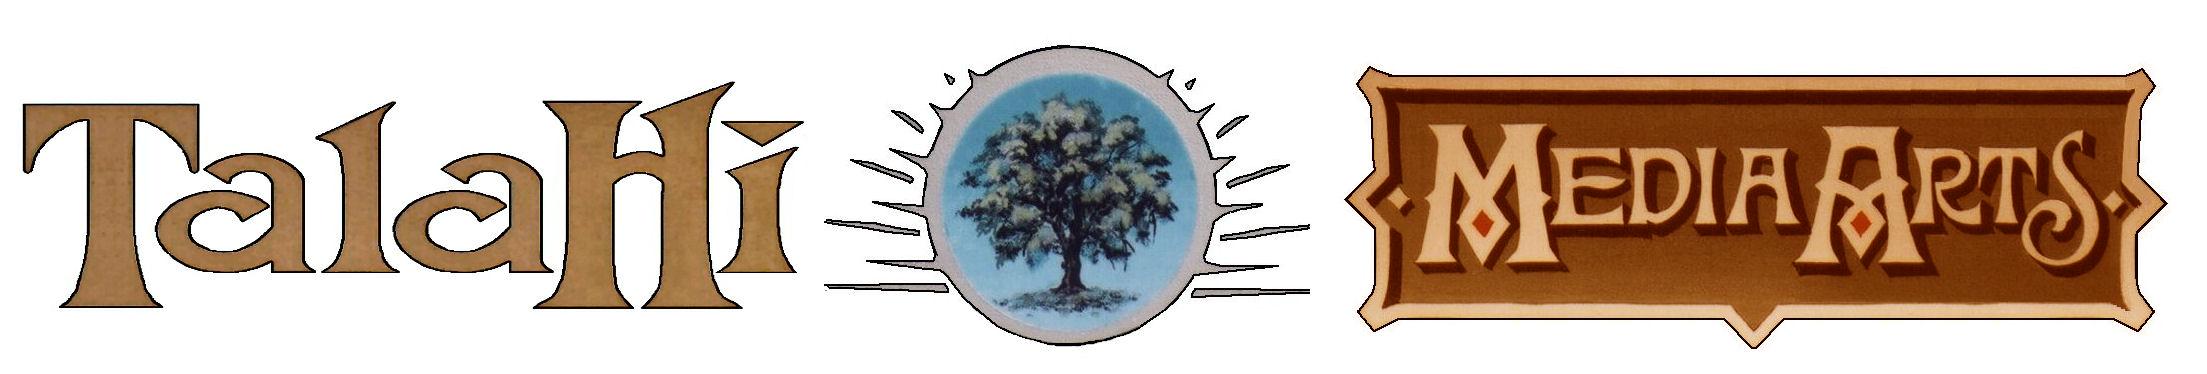 loga-vertical-letterhead